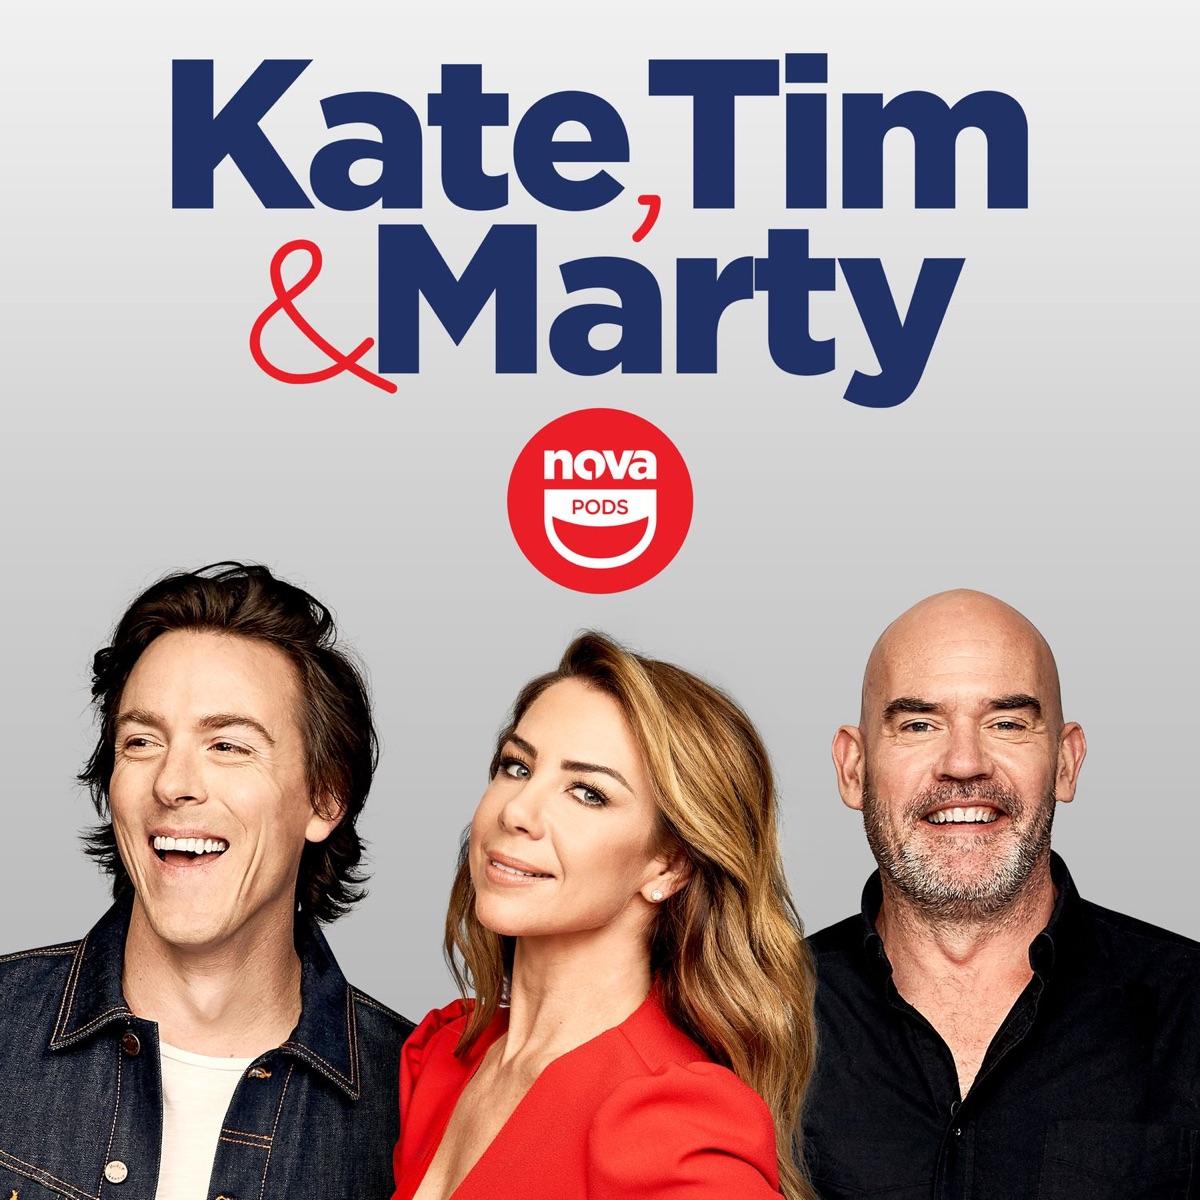 Kate, Tim & Marty